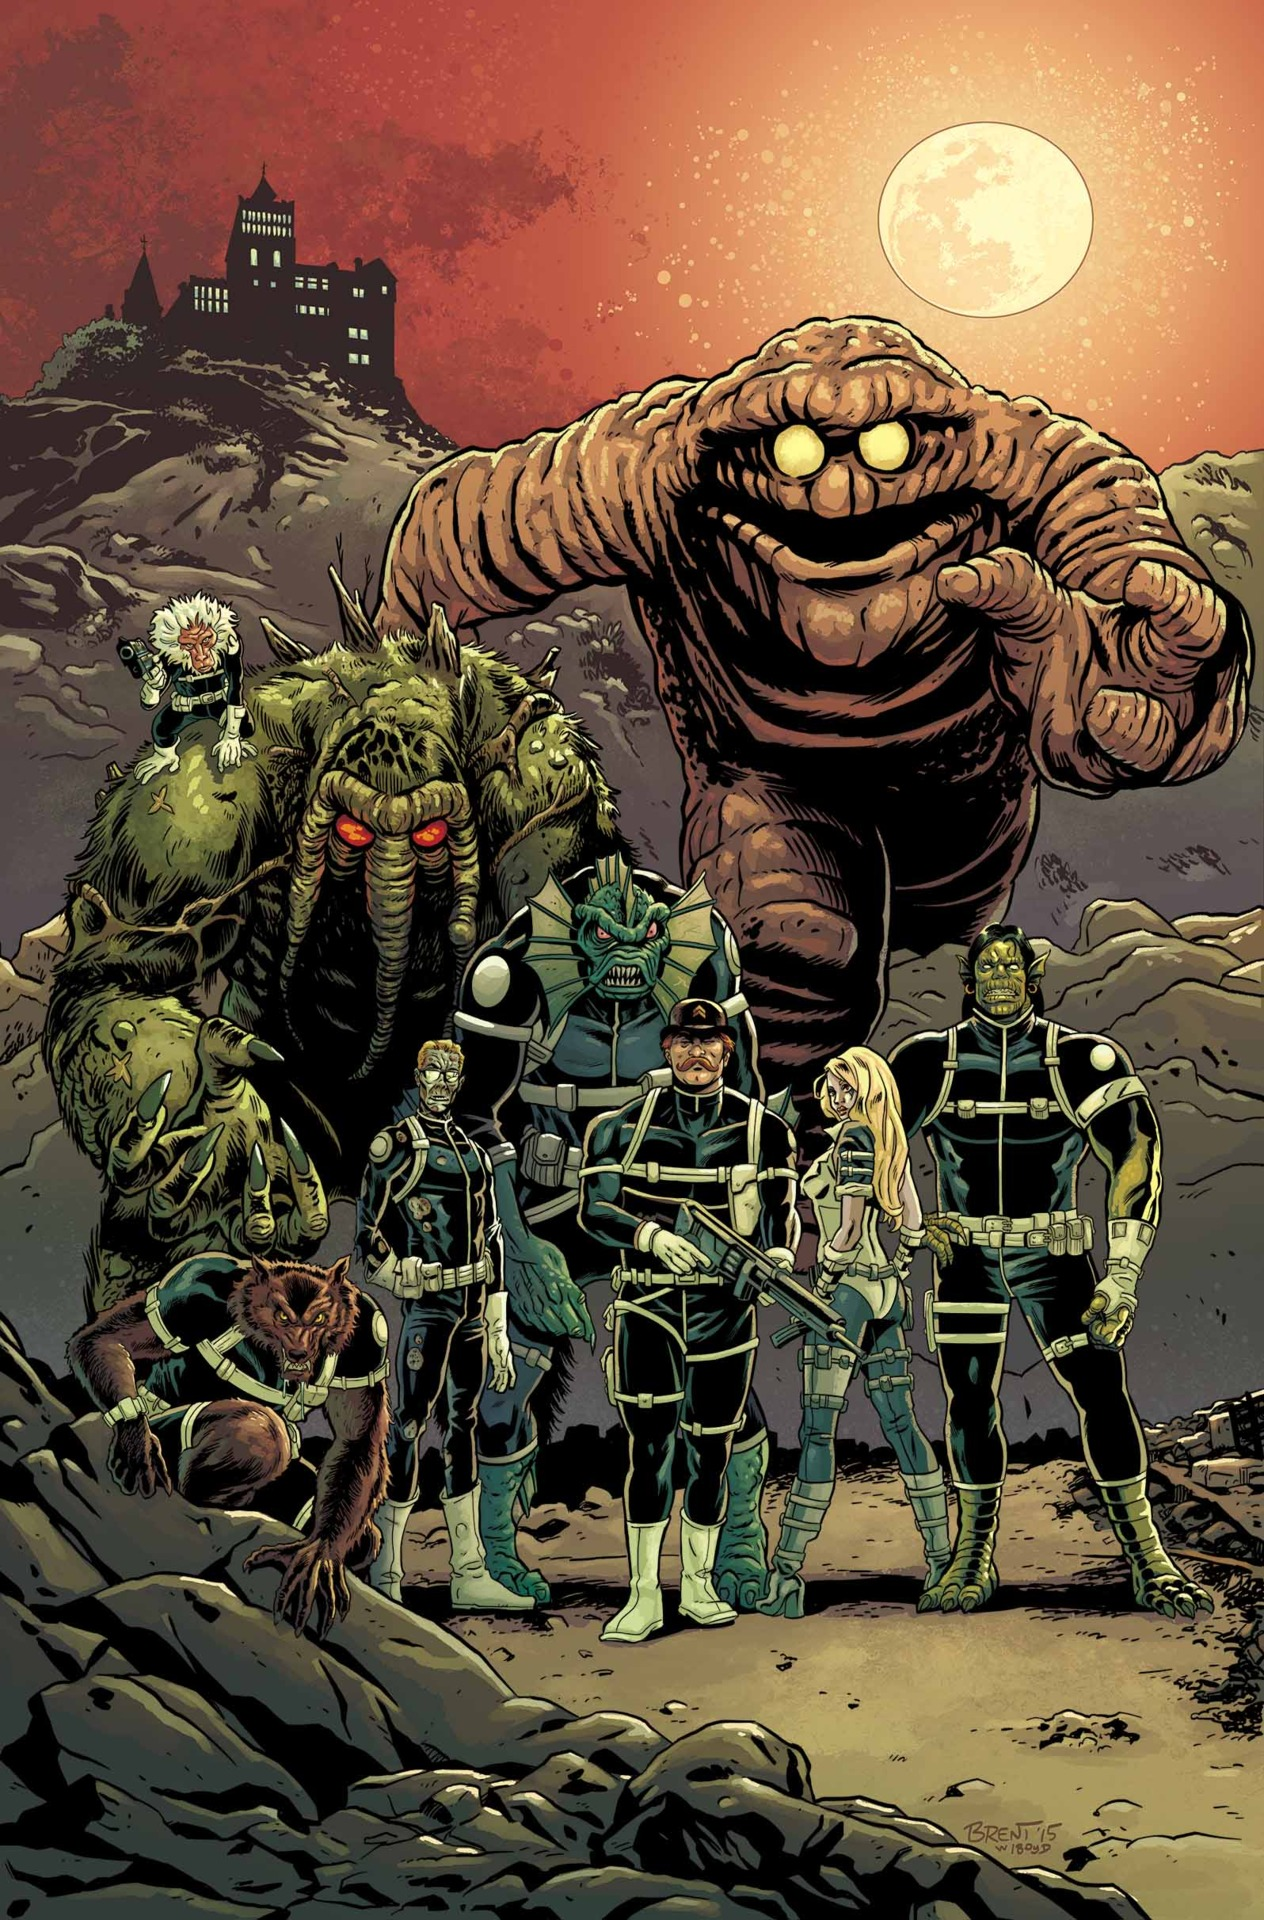 Howling Commandos of S.H.I.E.L.D. Vol 1 1 Textless.jpg